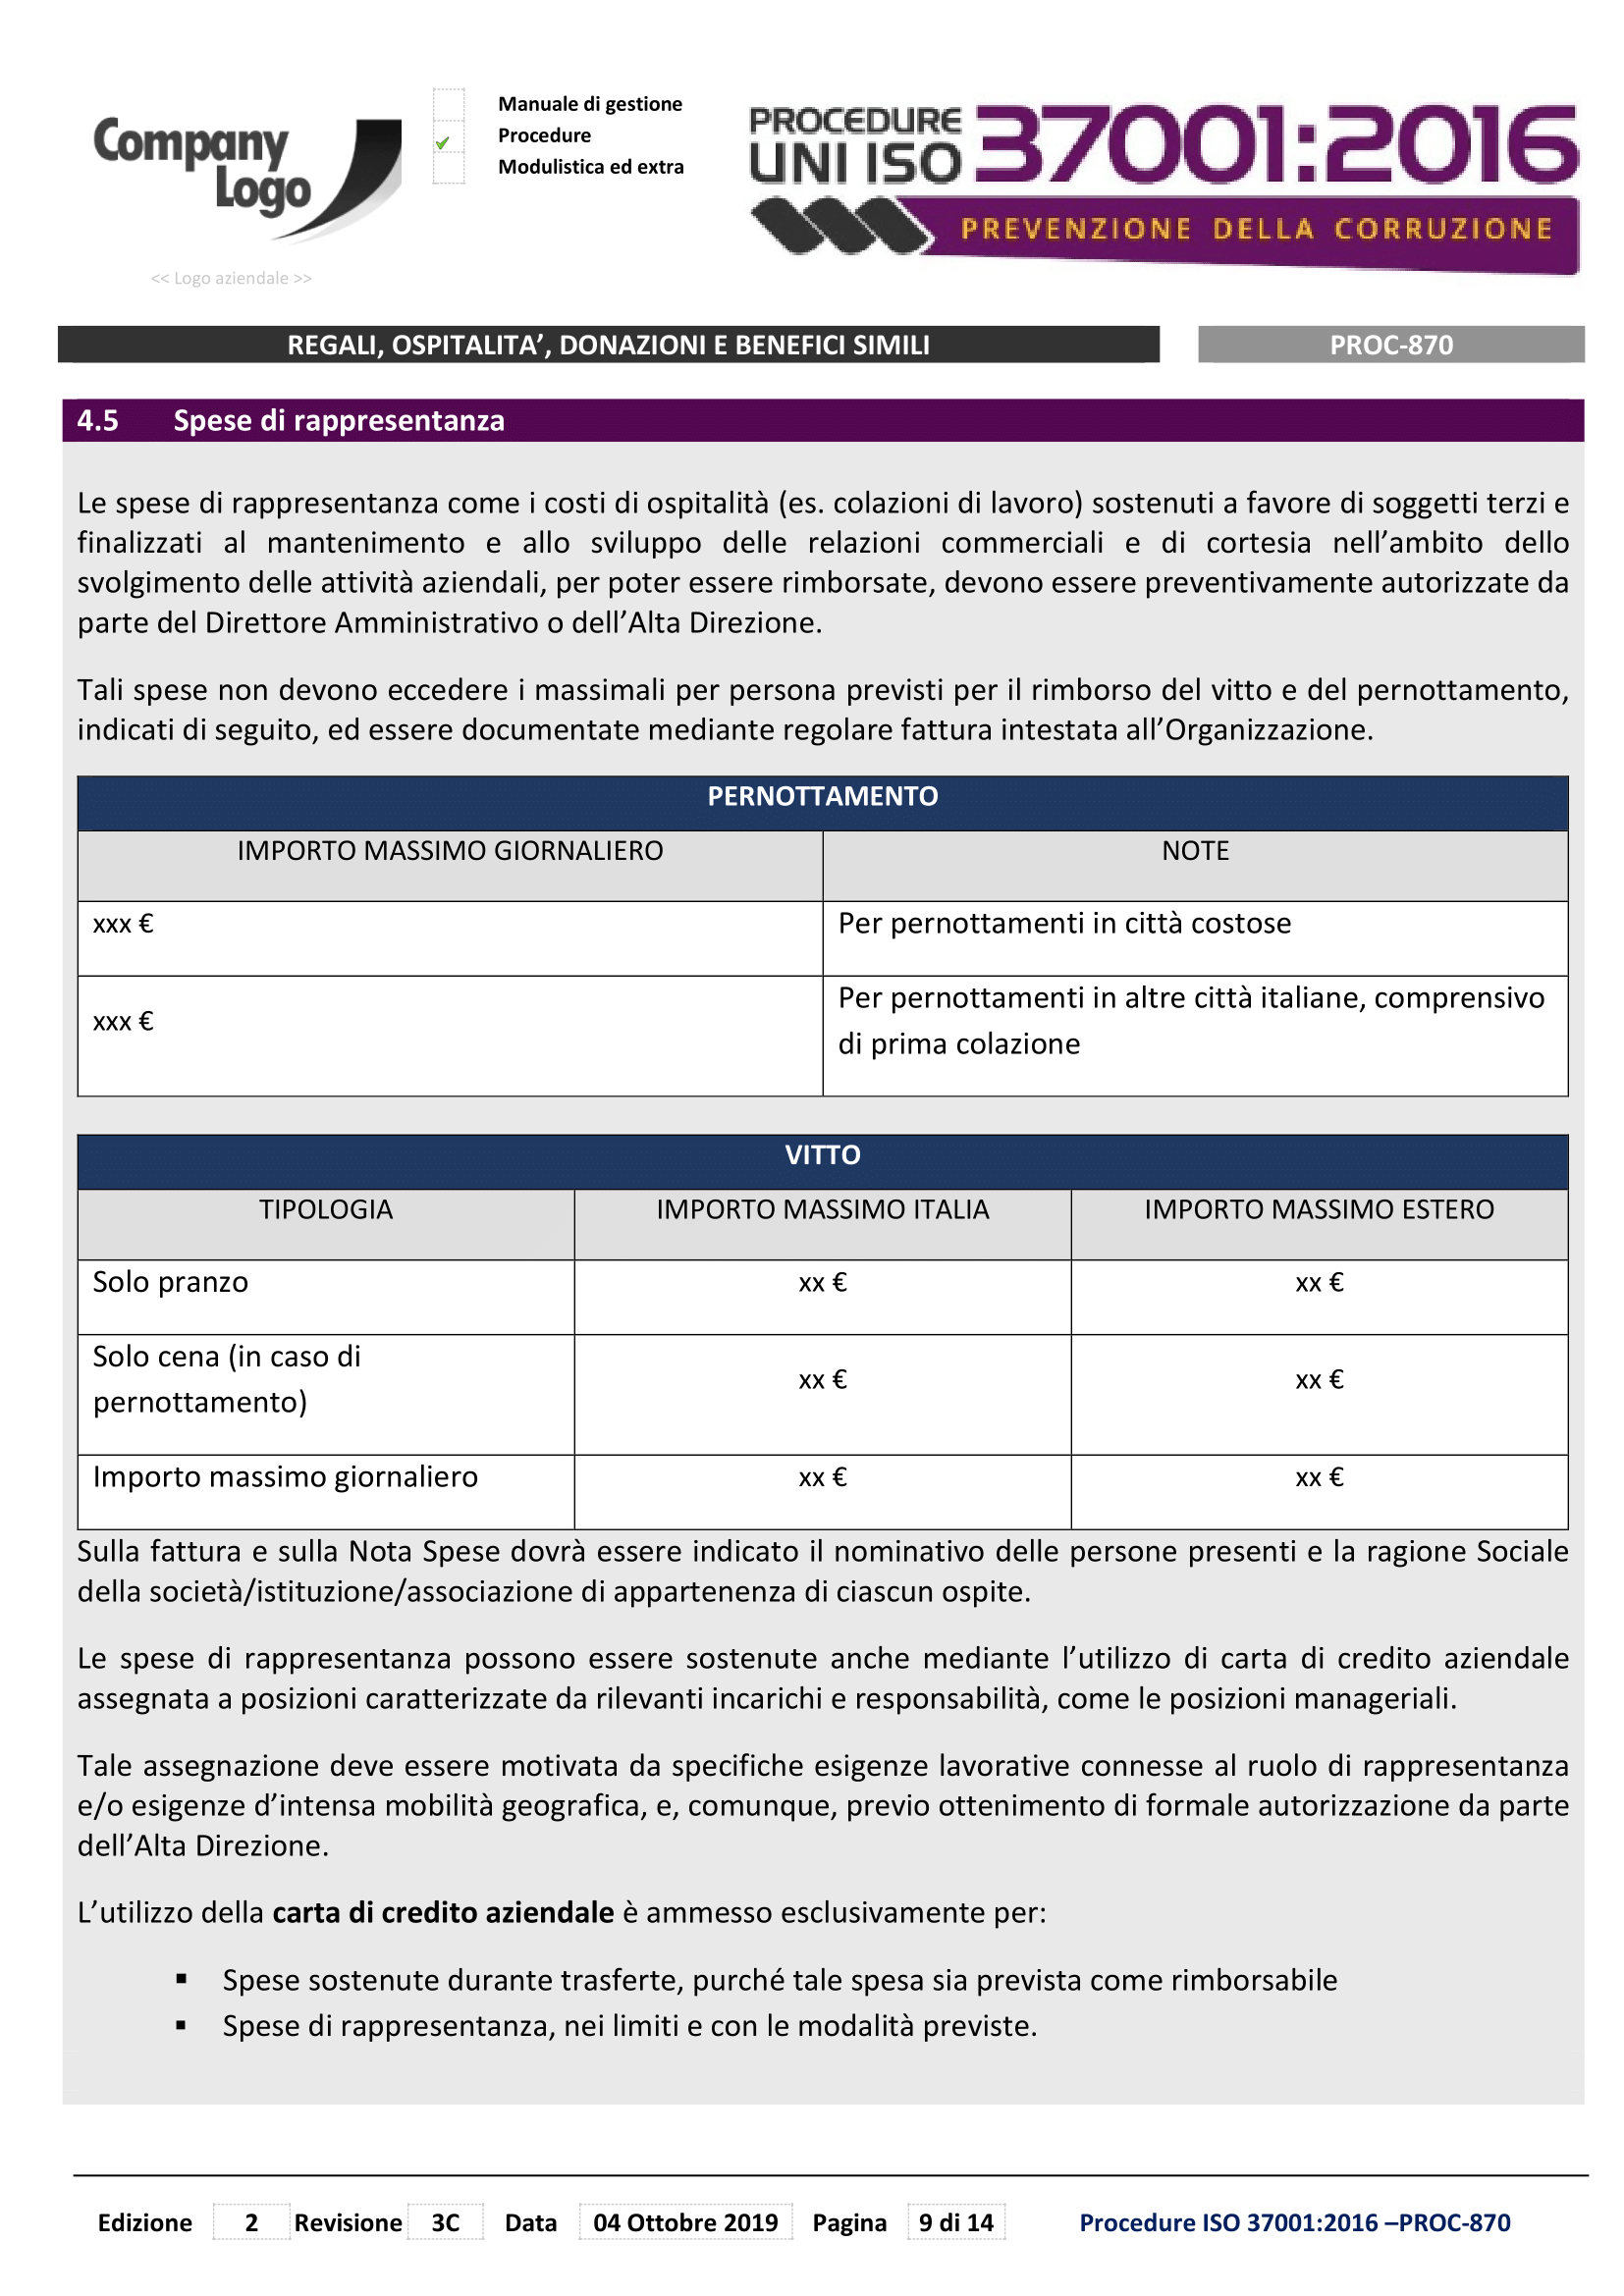 10.benefici-carte-credito-37001